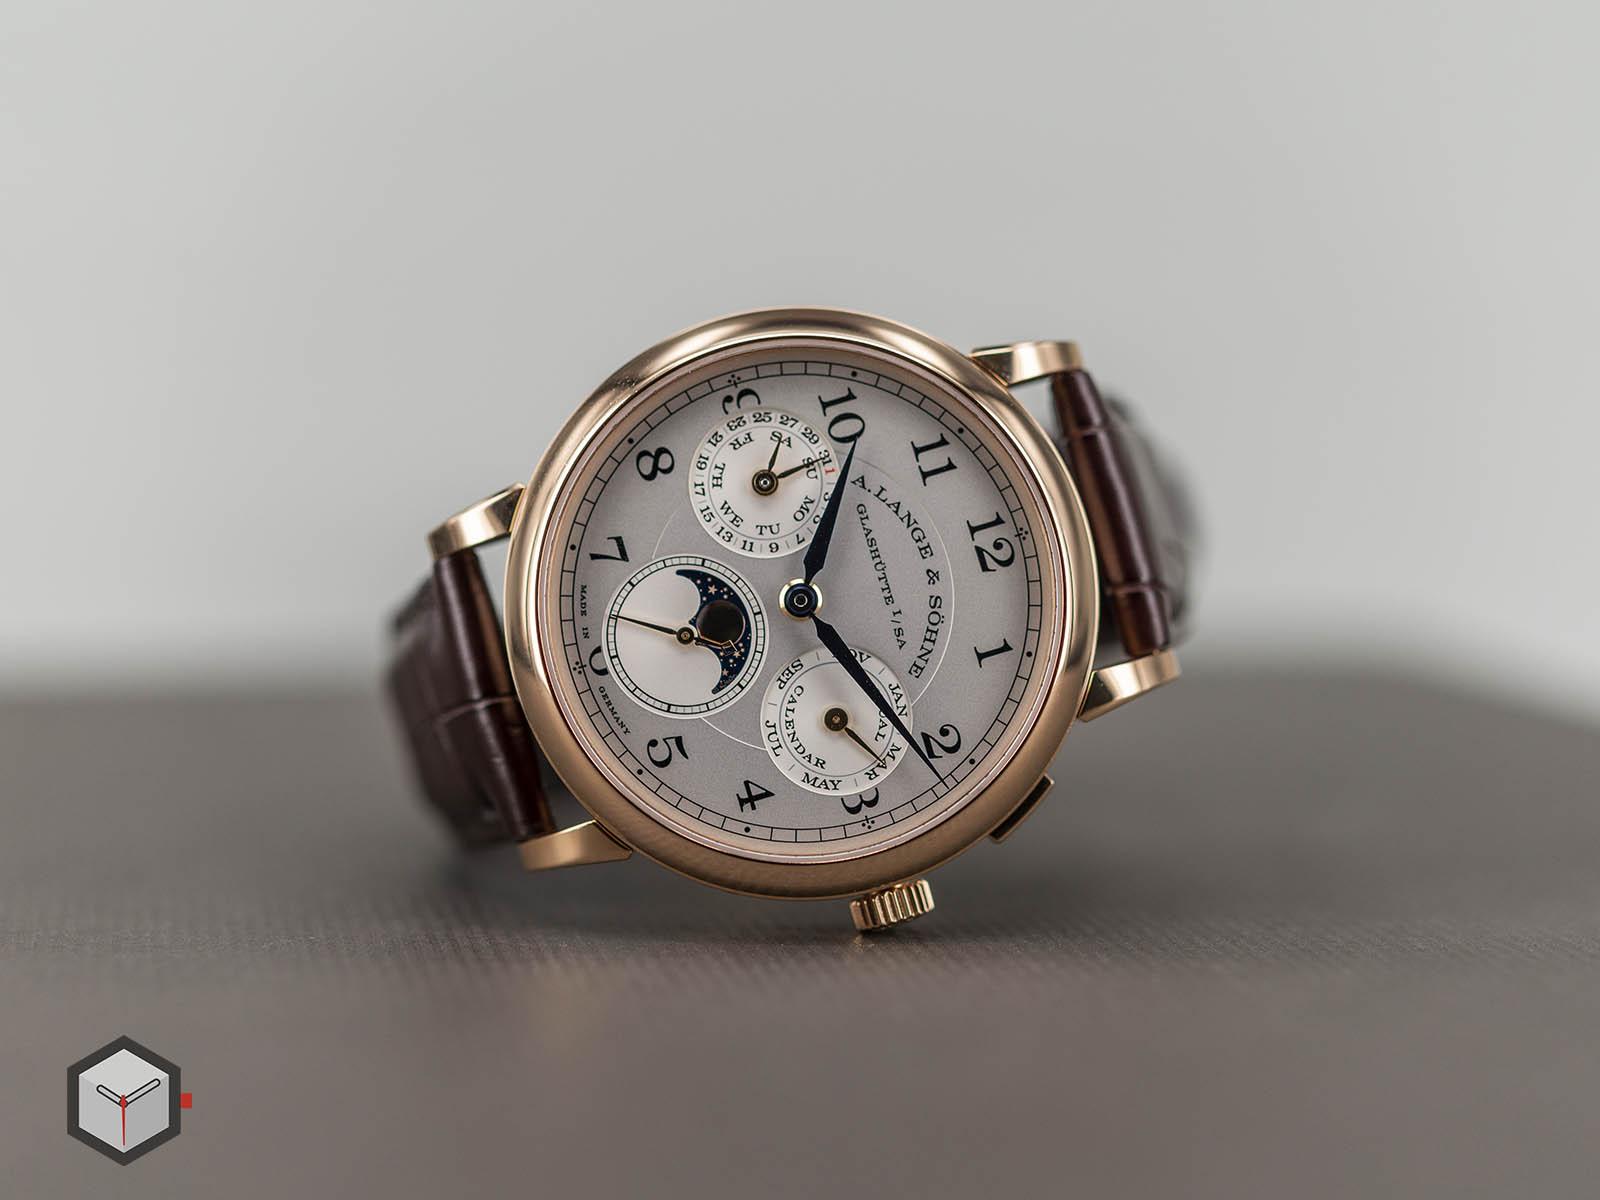 238-032-a-lange-sohne-1815-annual-calendar-18k-pink-gold-3.jpg